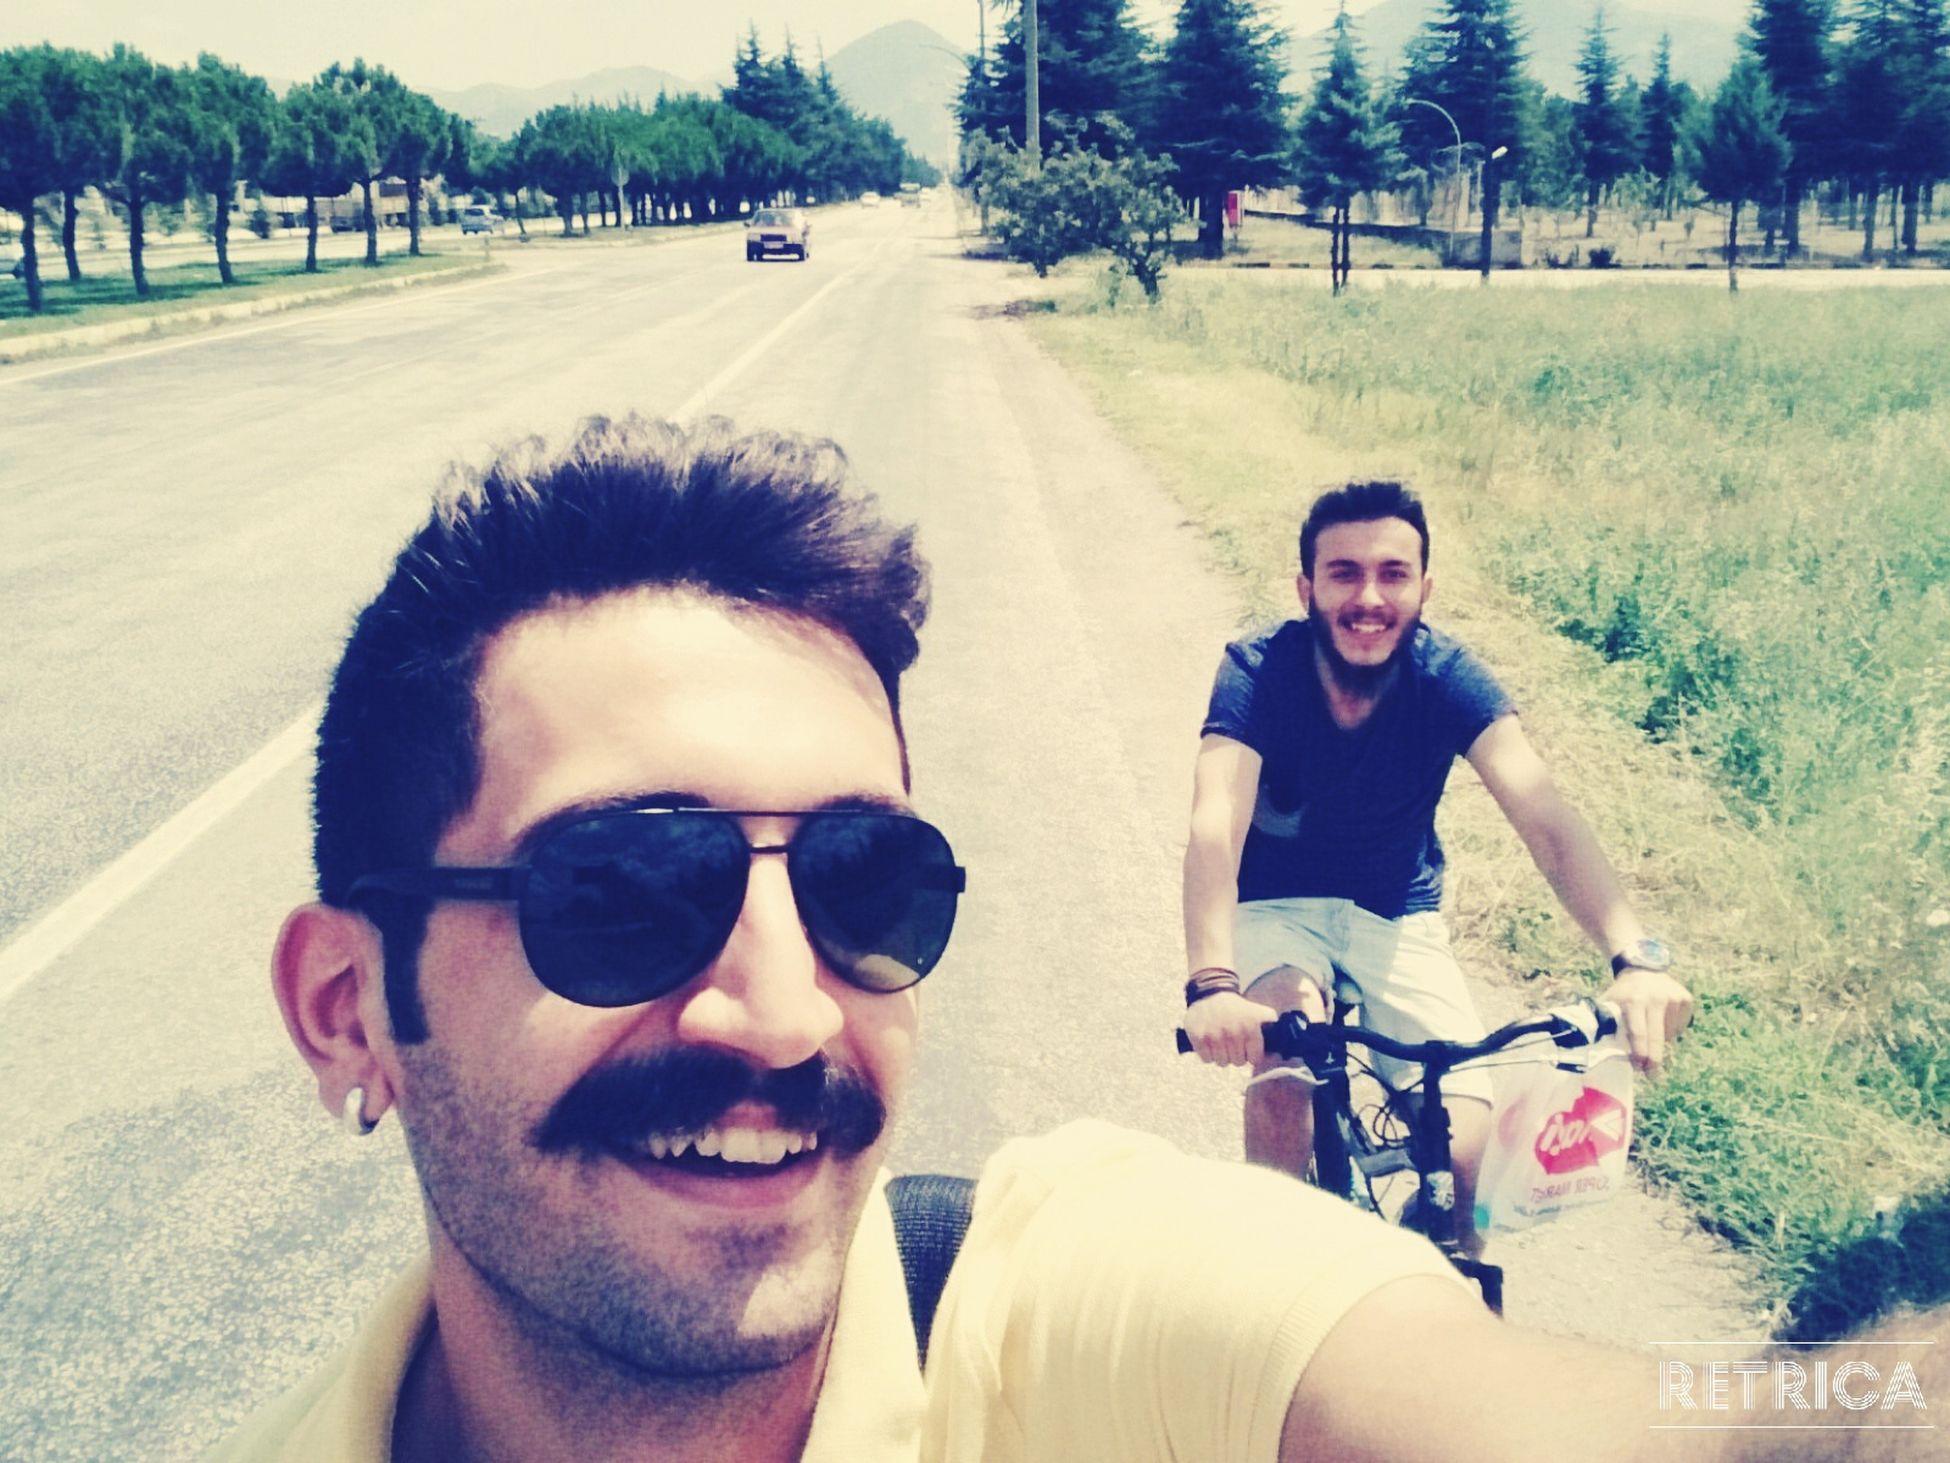 Bicycle Travel Photography Sunnyday☀️ Selfie ✌ Happy Saturday